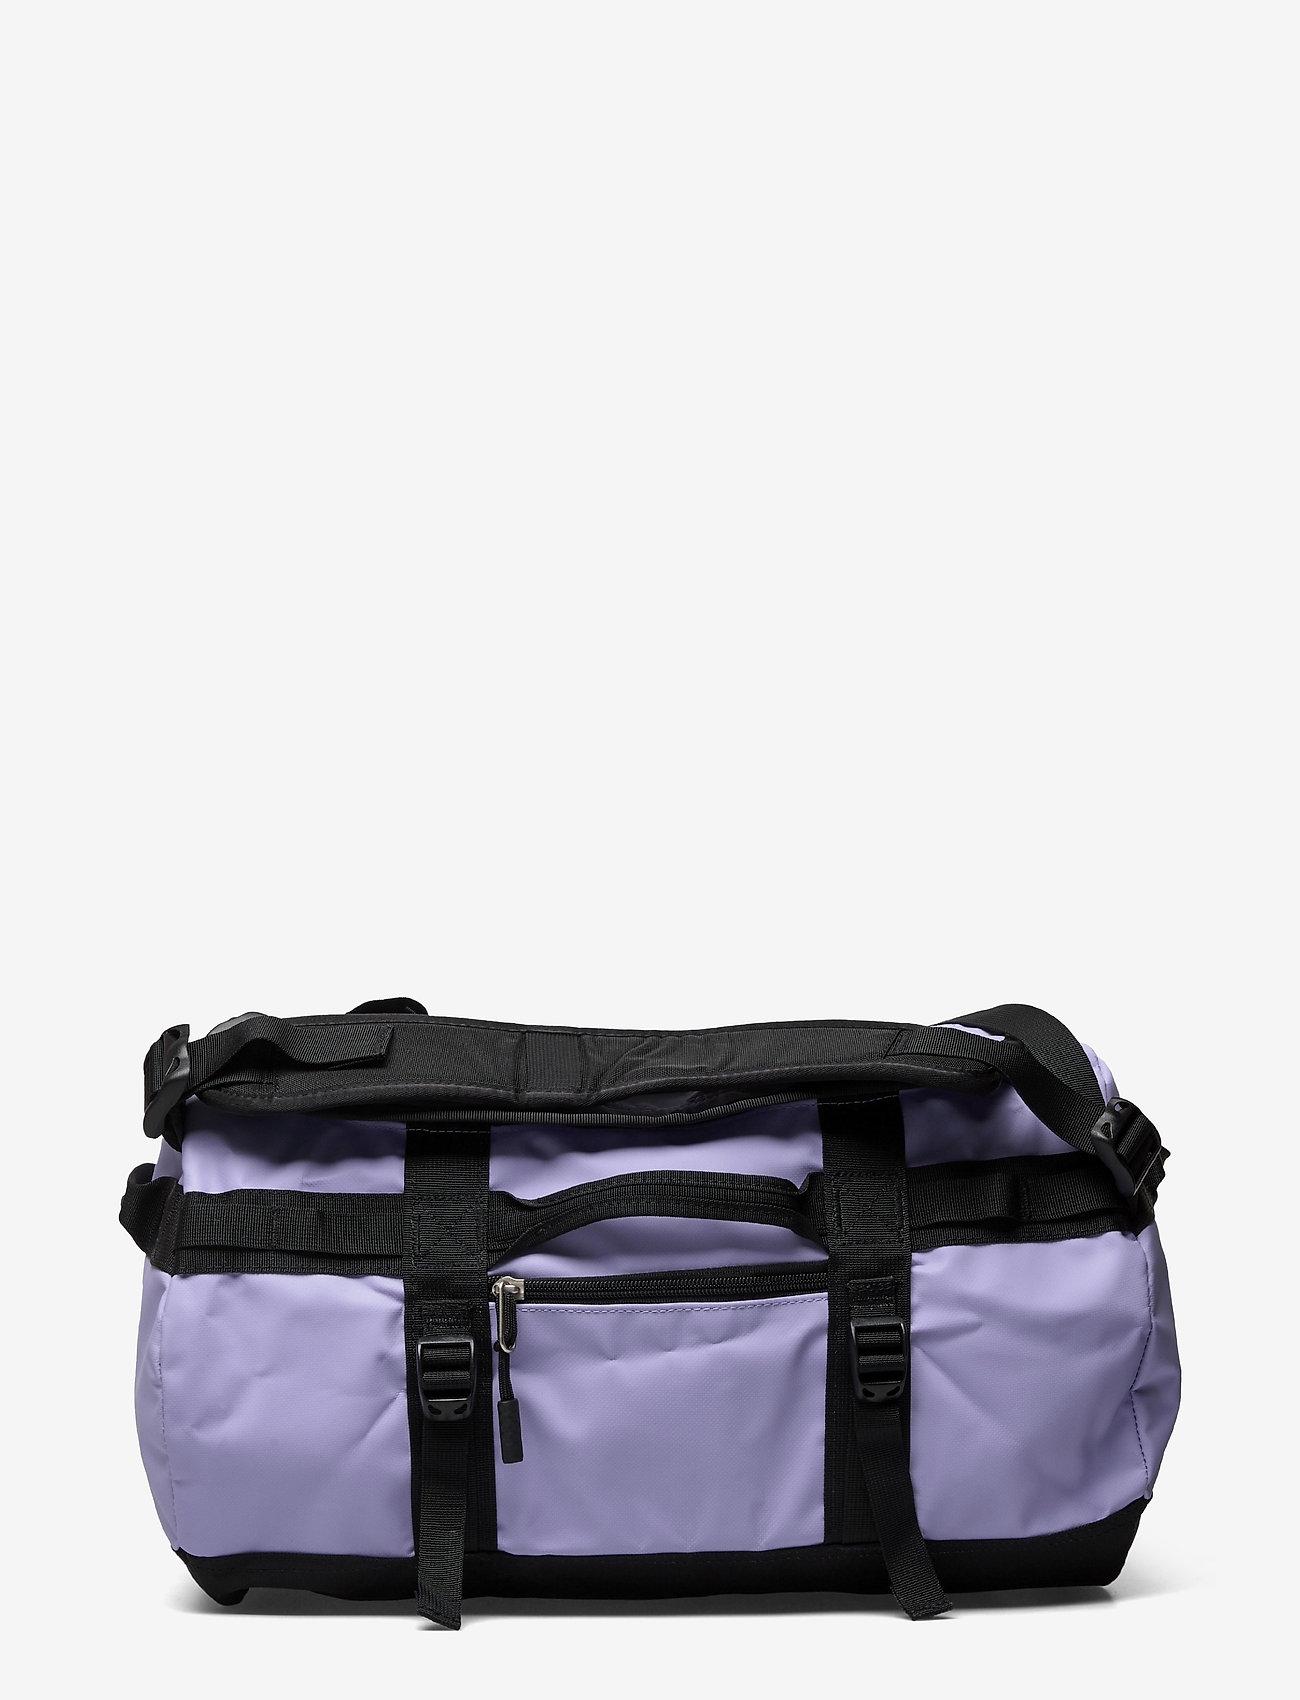 The North Face - BASE CAMP DUFFEL - XS - sacs de sport - sweet lavender-tnf black - 0